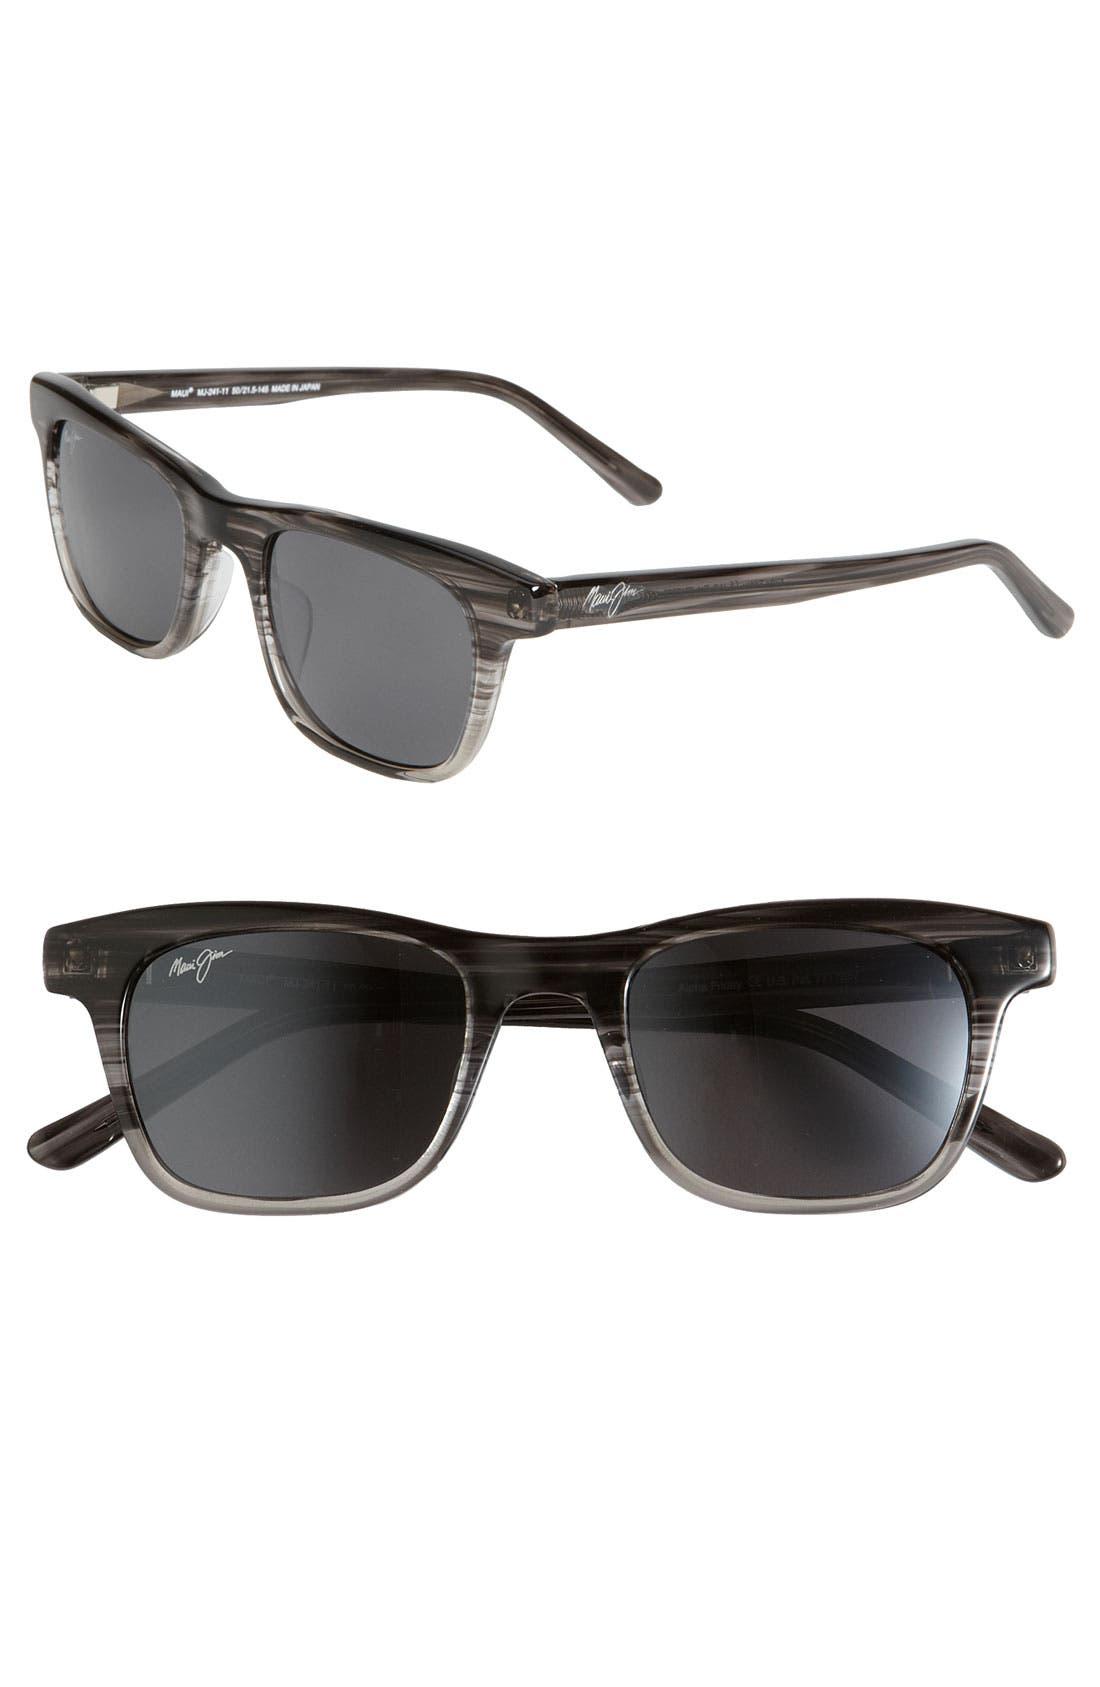 Alternate Image 1 Selected - Maui Jim 'Aloha Friday - PolarizedPlus®2' Retro Inspired Sunglasses